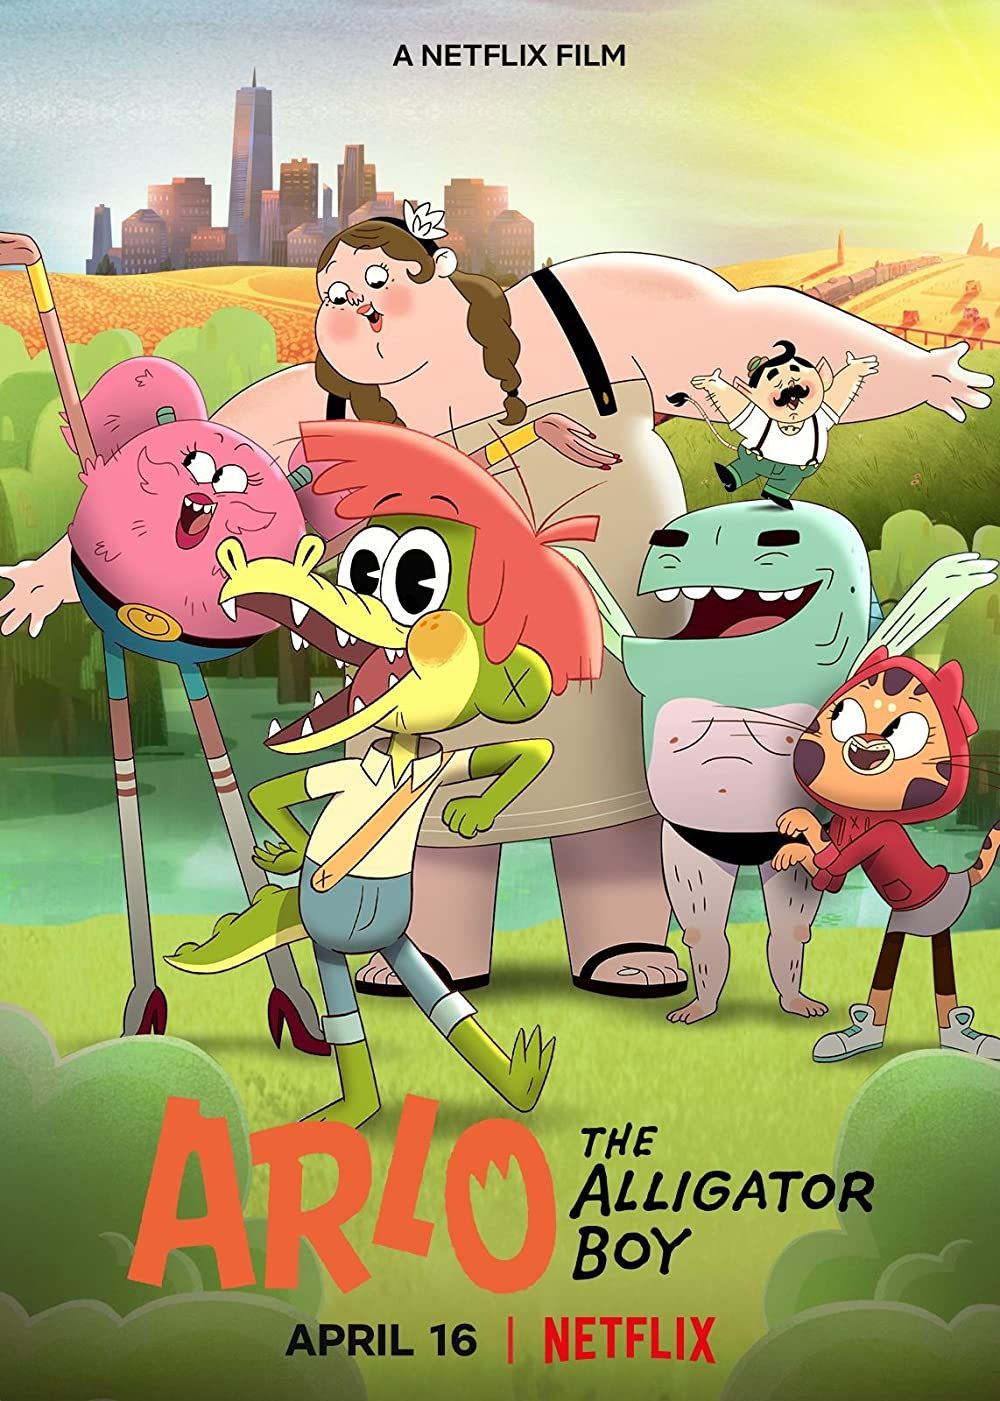 Arlo the Alligator Boy (2021) English Movie 720p HDRip 1.2GB Download